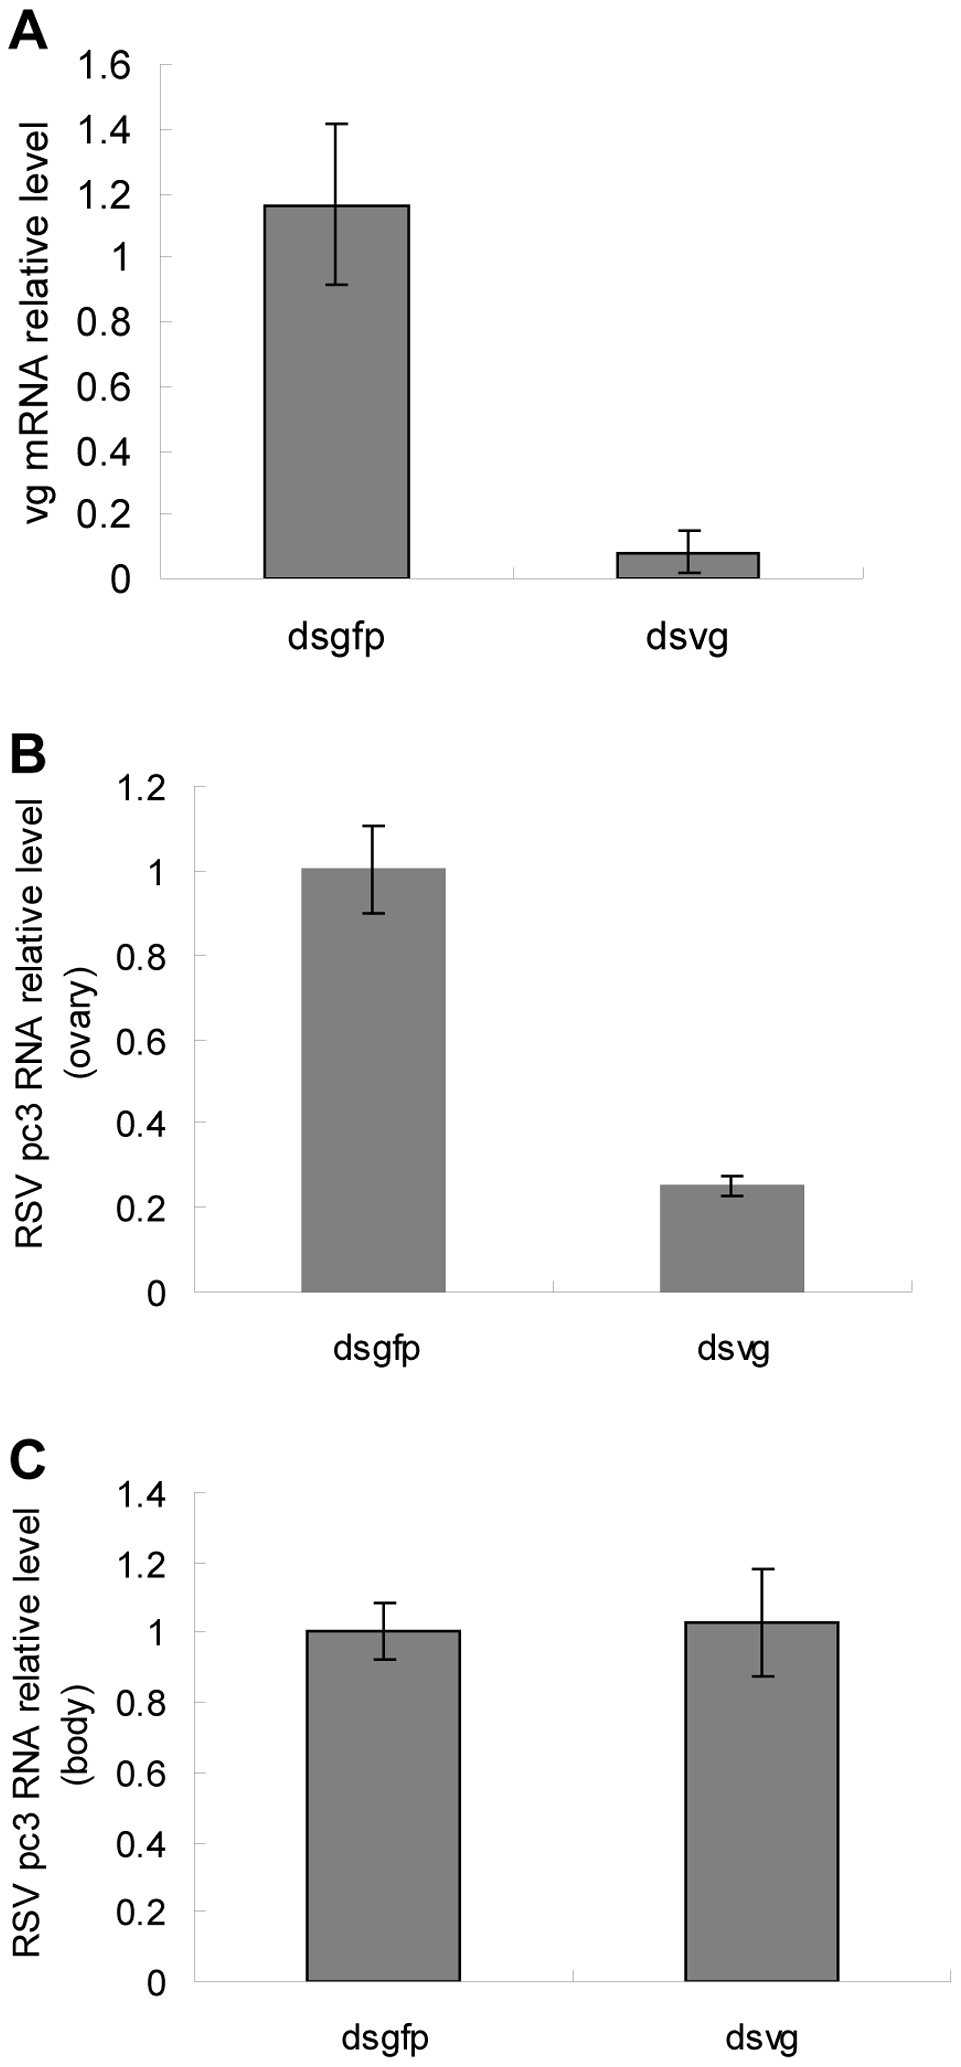 Quantitative assay of RSV in dsRNA-injected ovarioles.